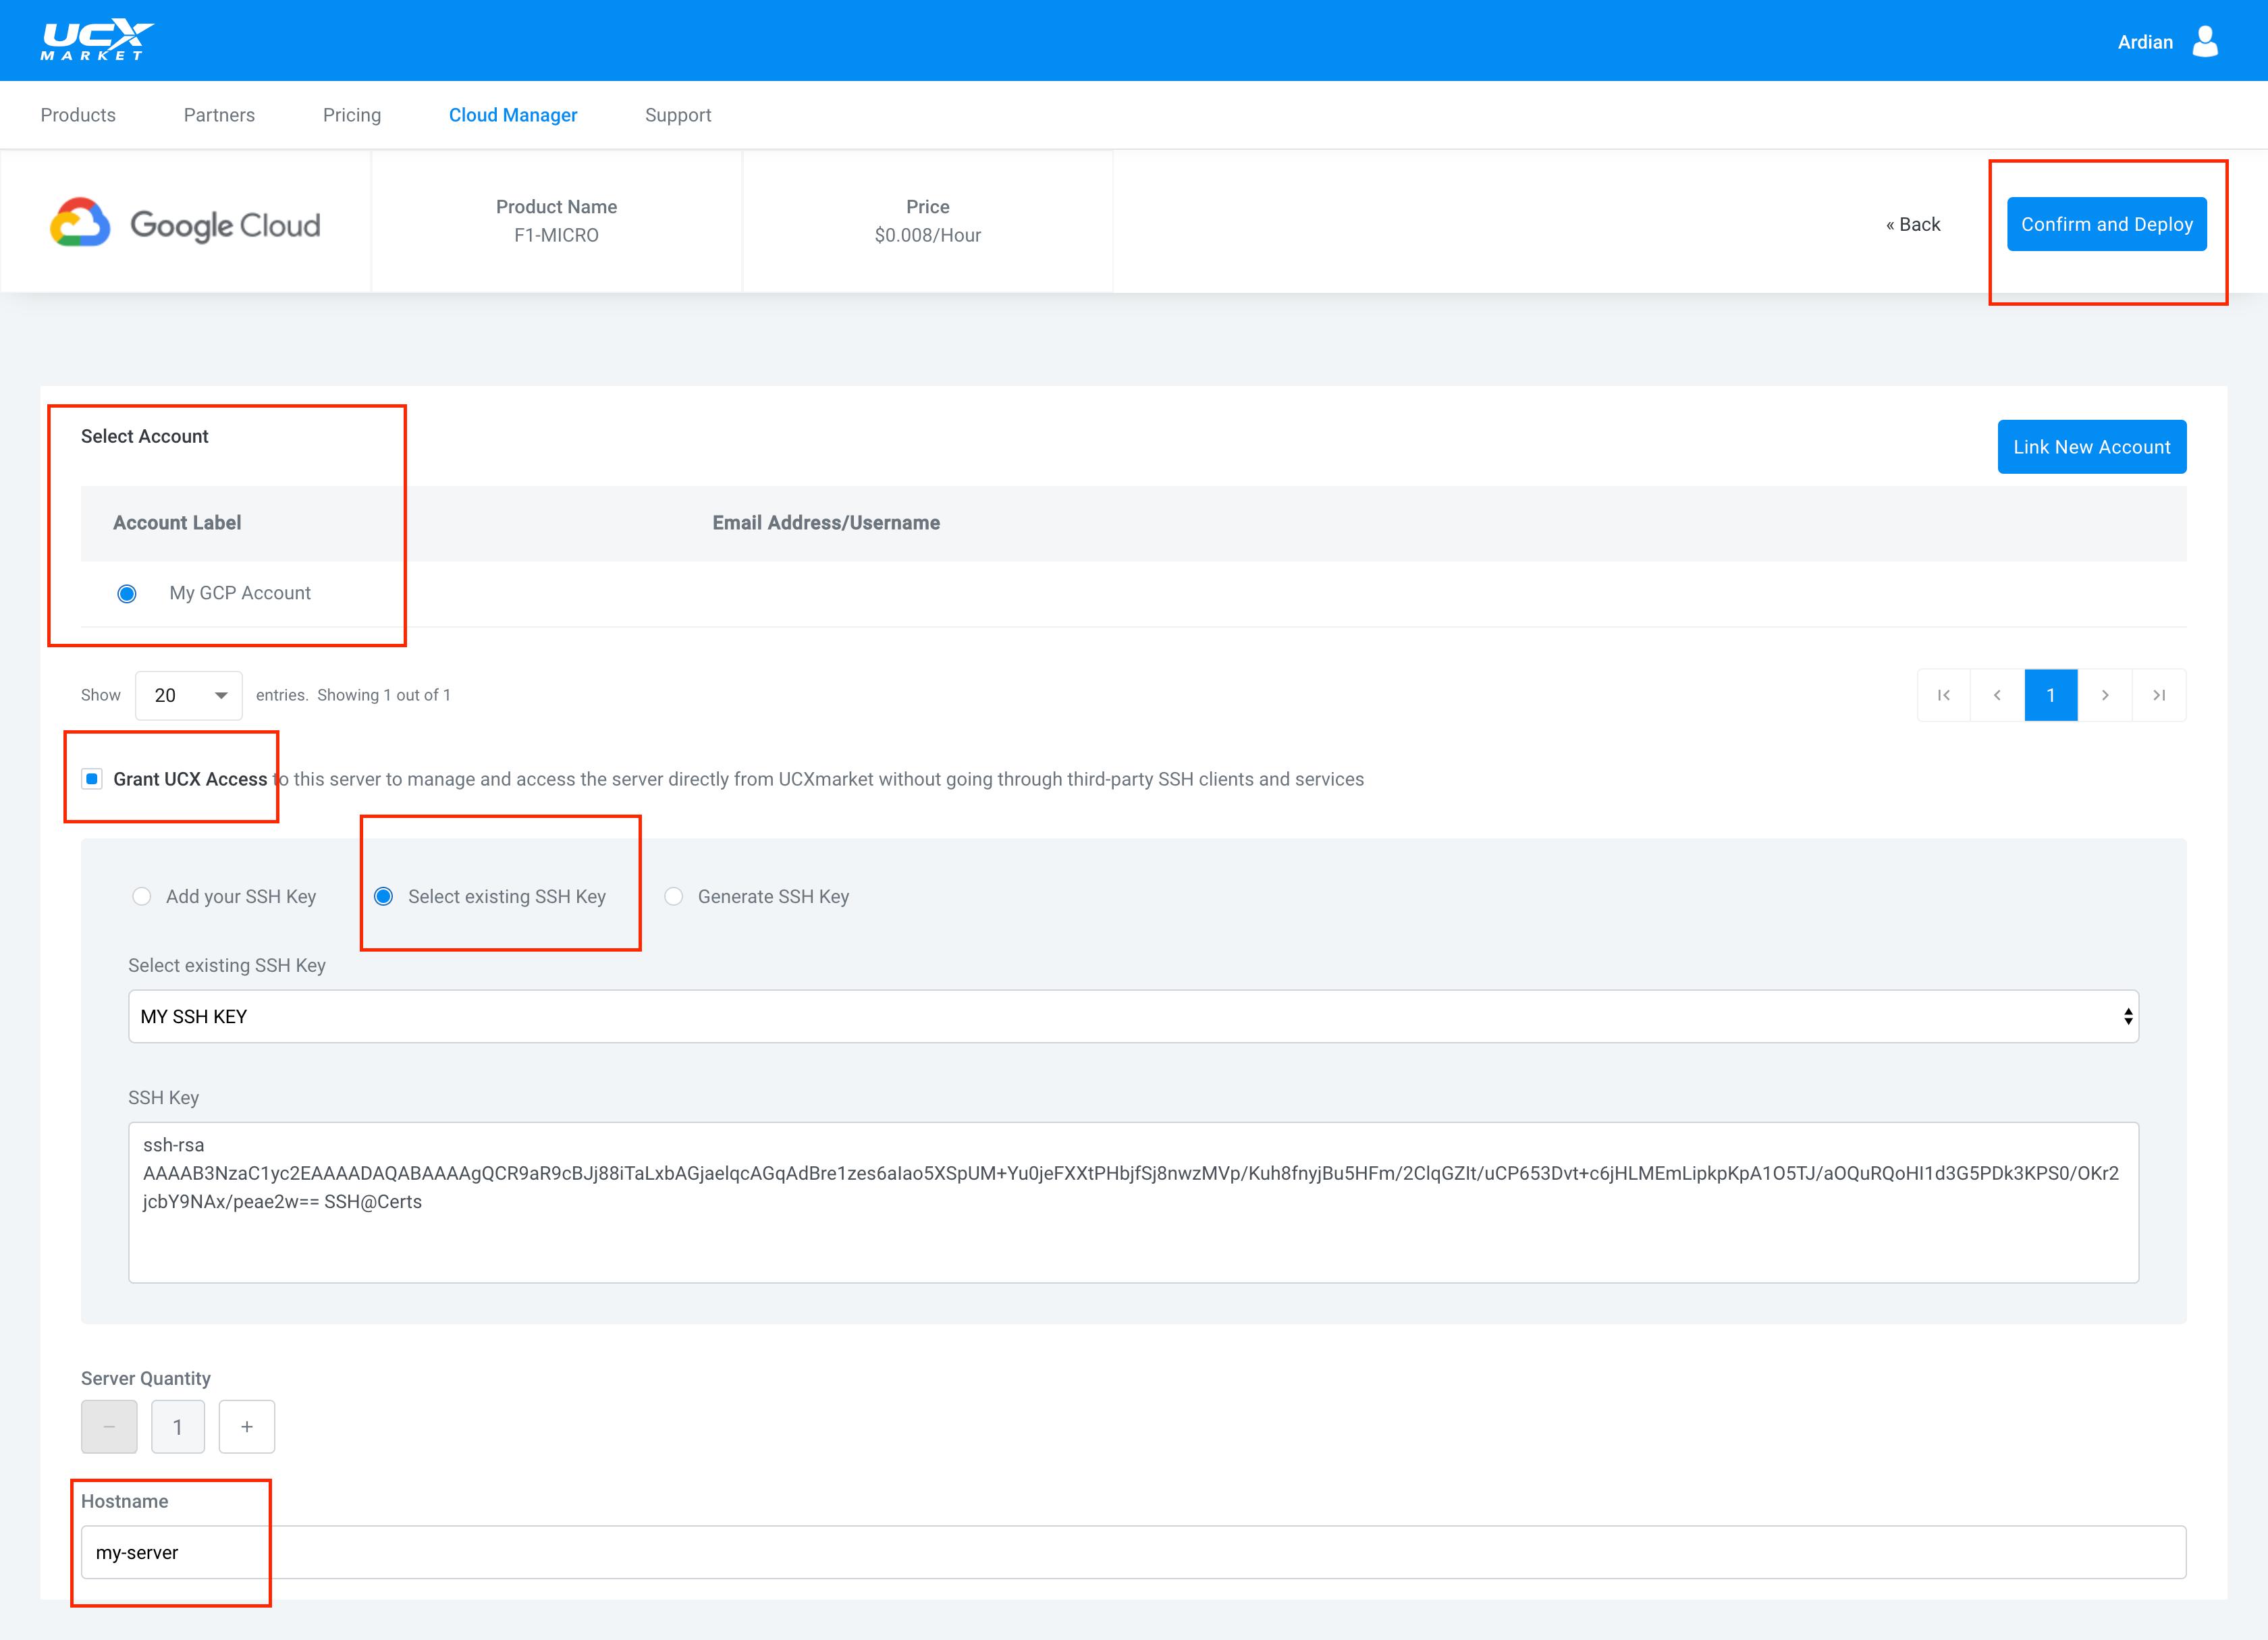 screencapture-qa-cloud-ucxmarket-deploy-servers-2020-05-07-09_43_22.png